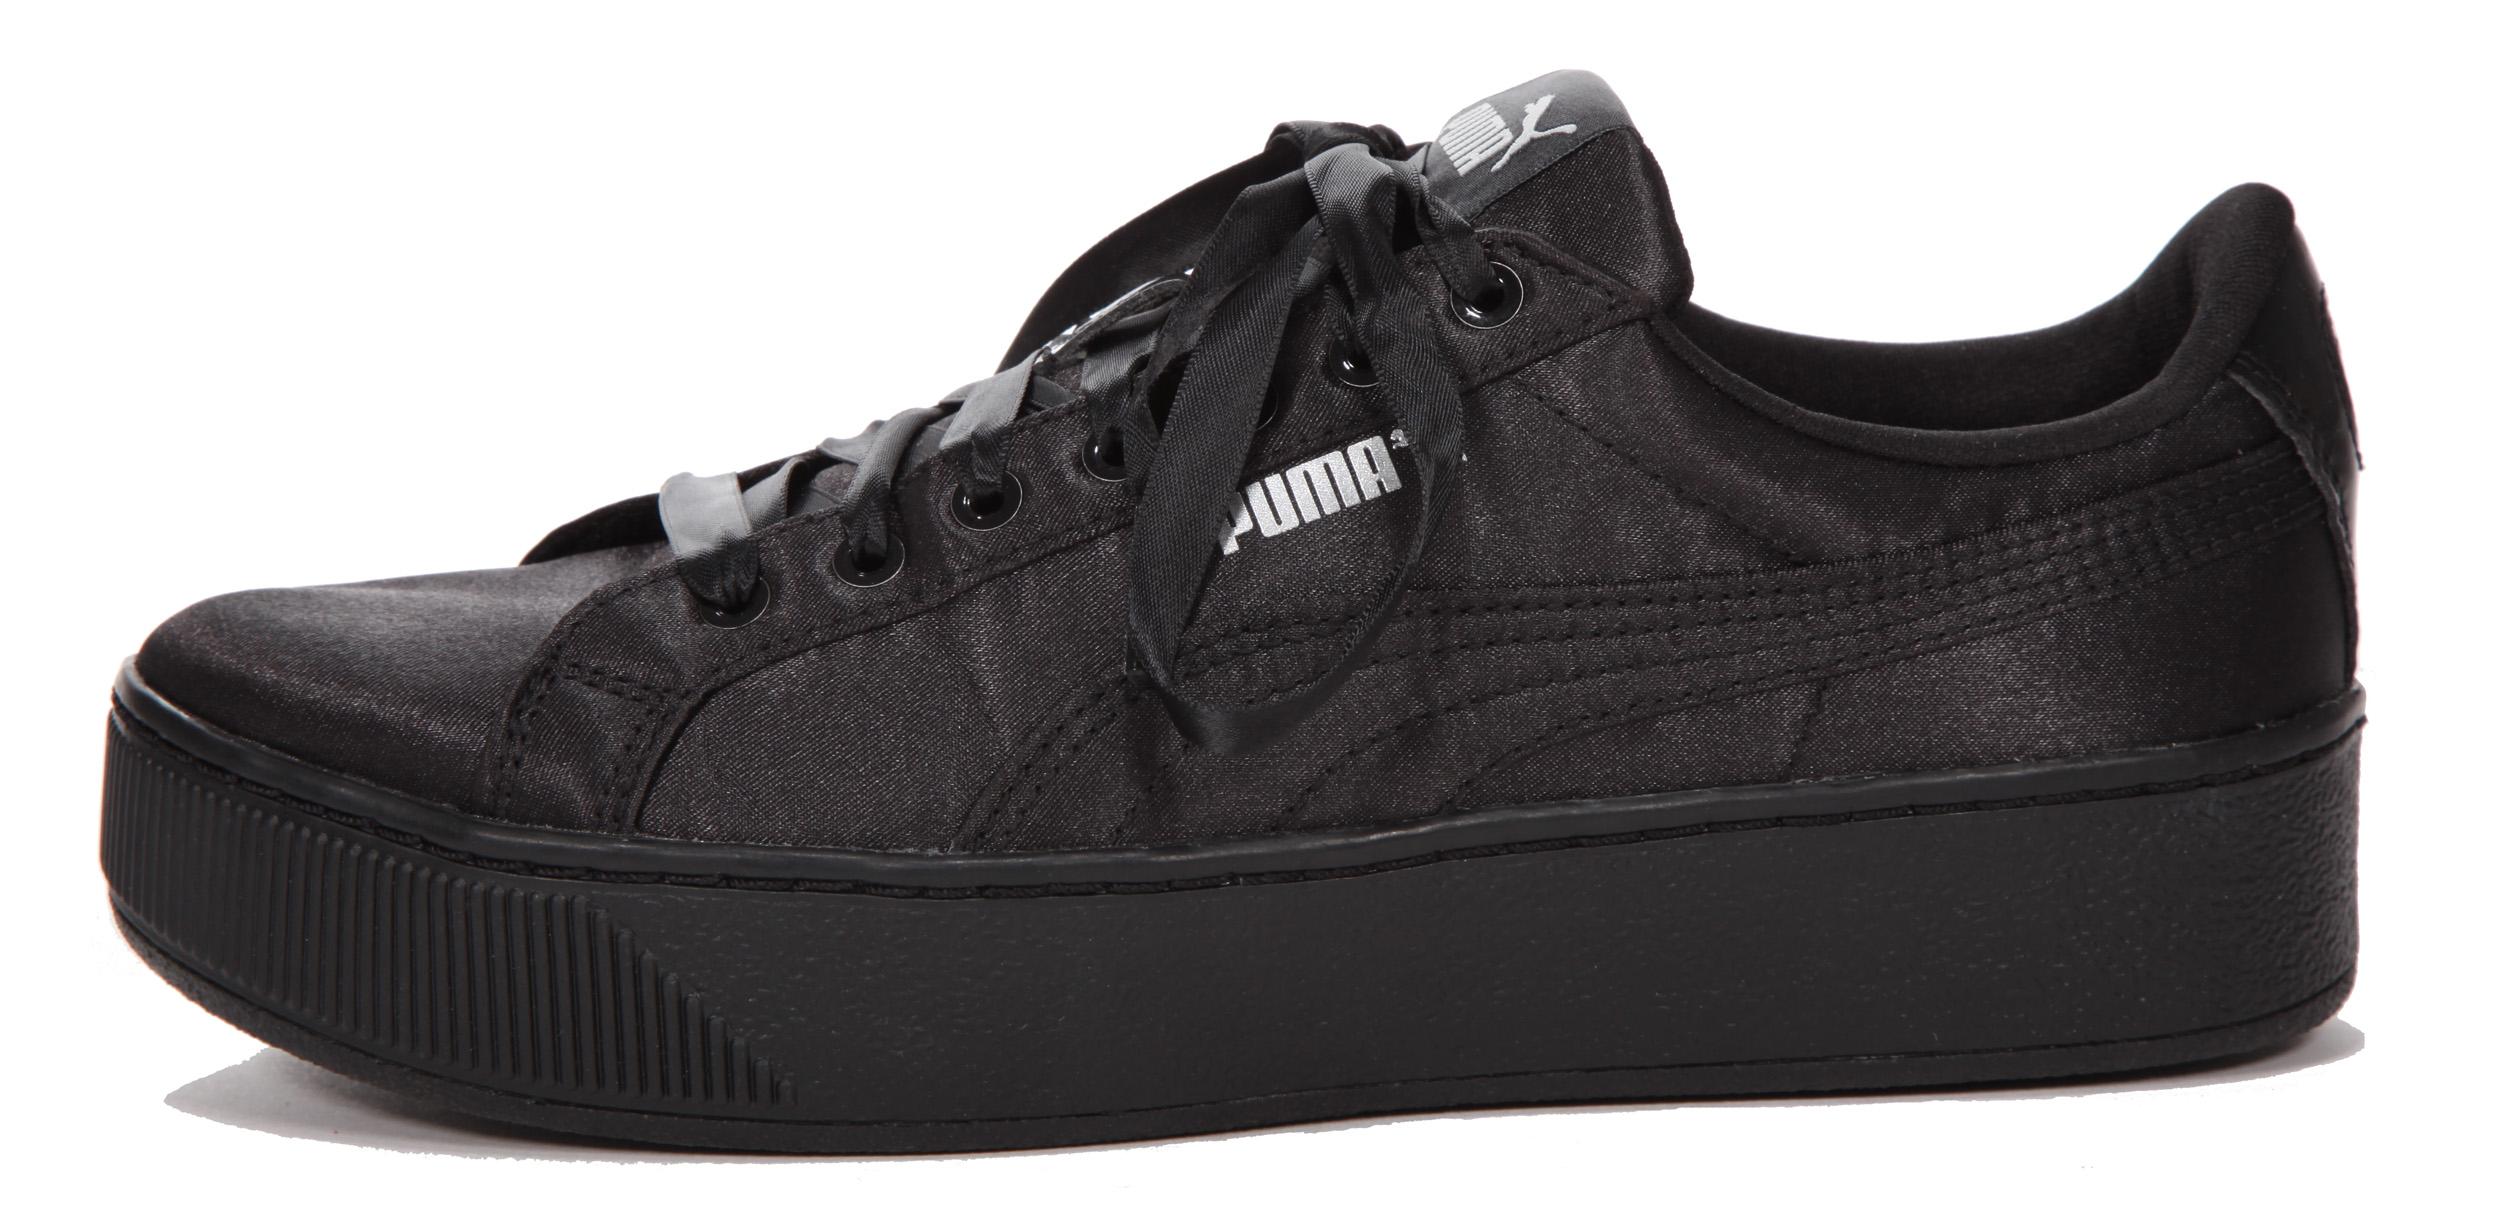 Puma Damen Plateau Sneaker schwarz